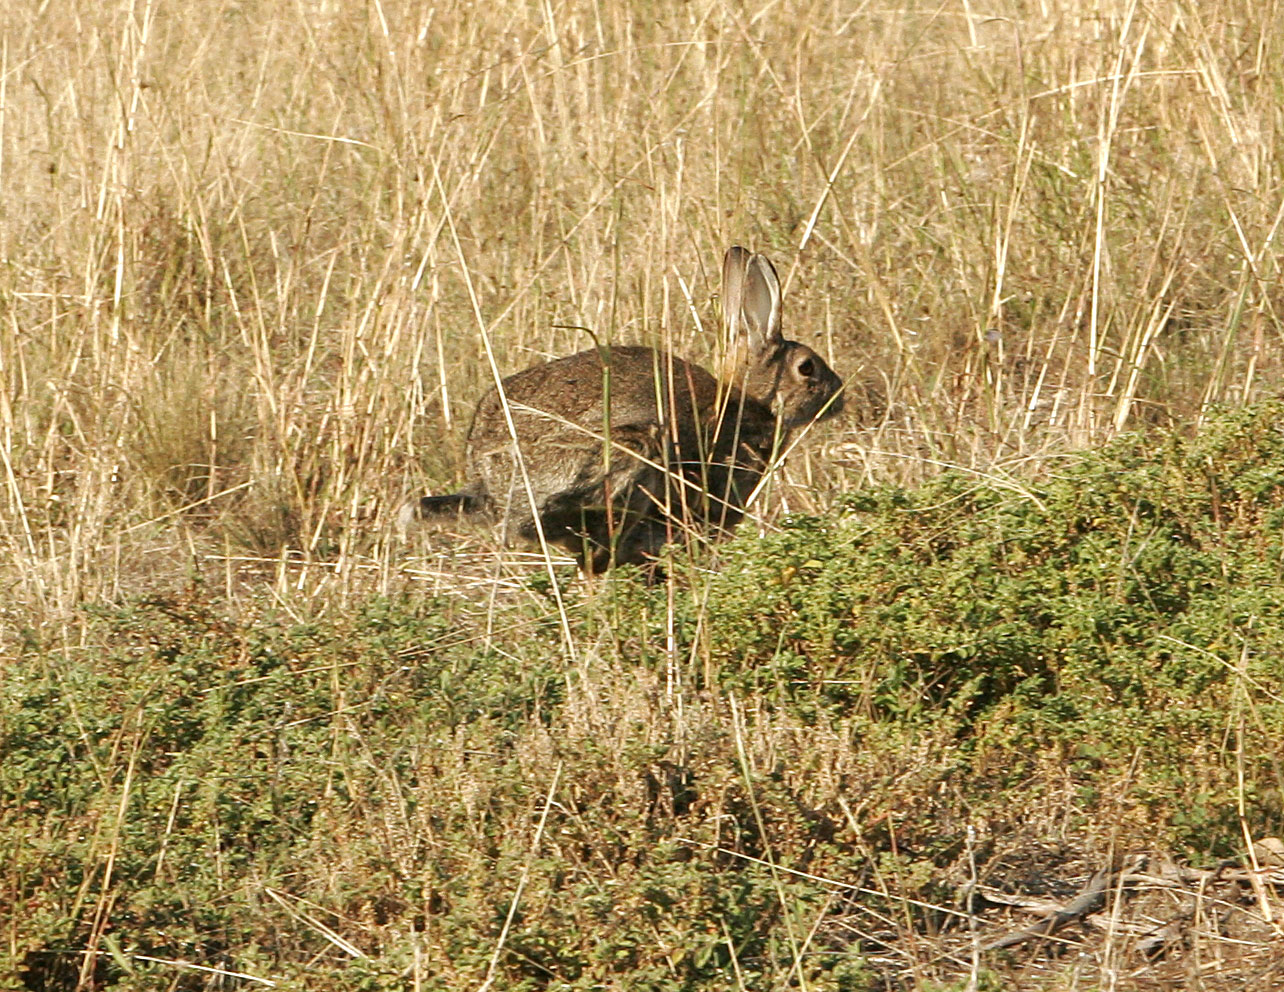 Image:Wild rabbit.jpg